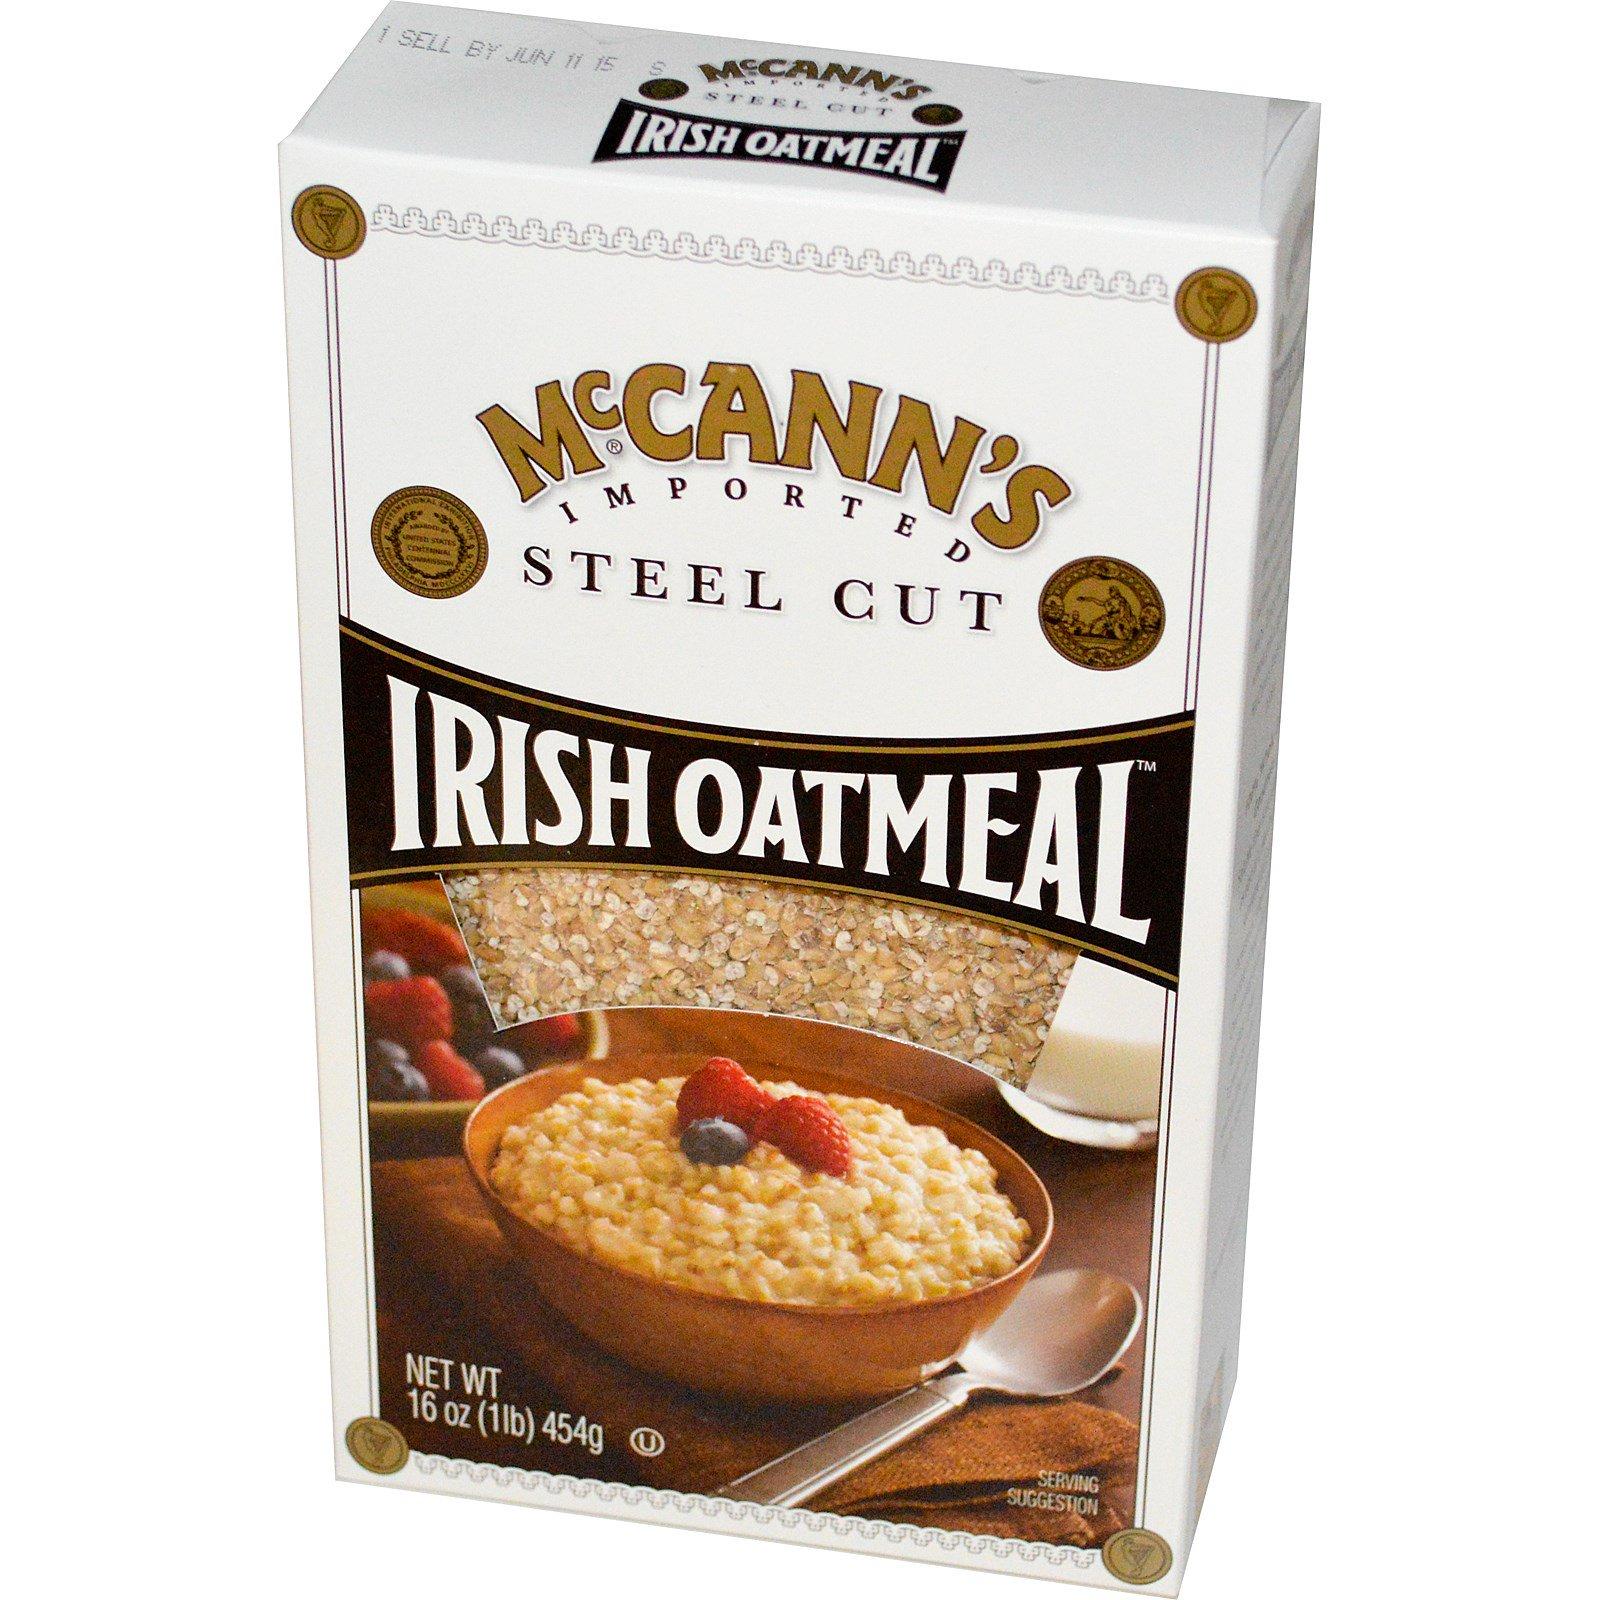 McCann's Irish Oatmeal, Дробленый овес, 16 унций (454 г)